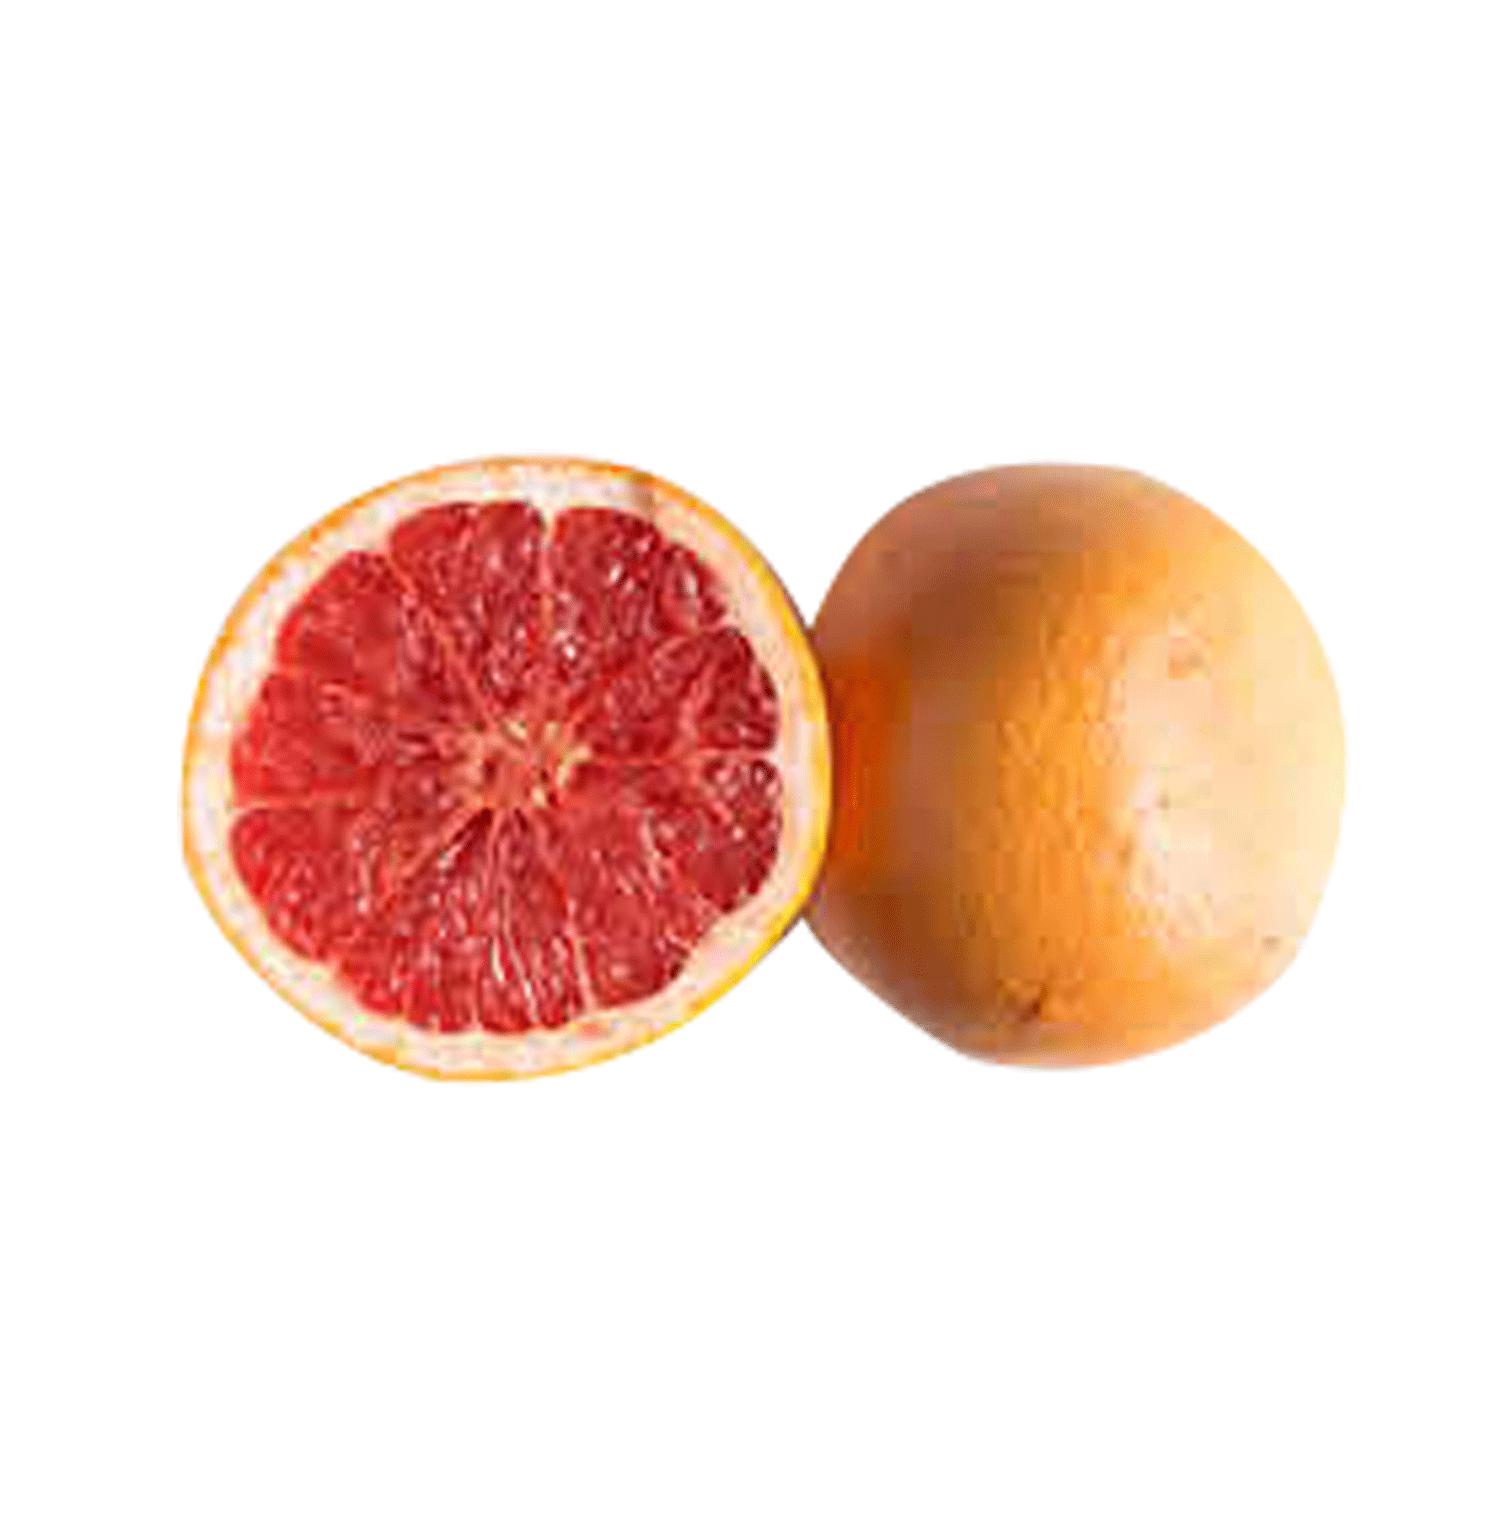 Blood orange png. Grapefruit juice tangelo volkamer